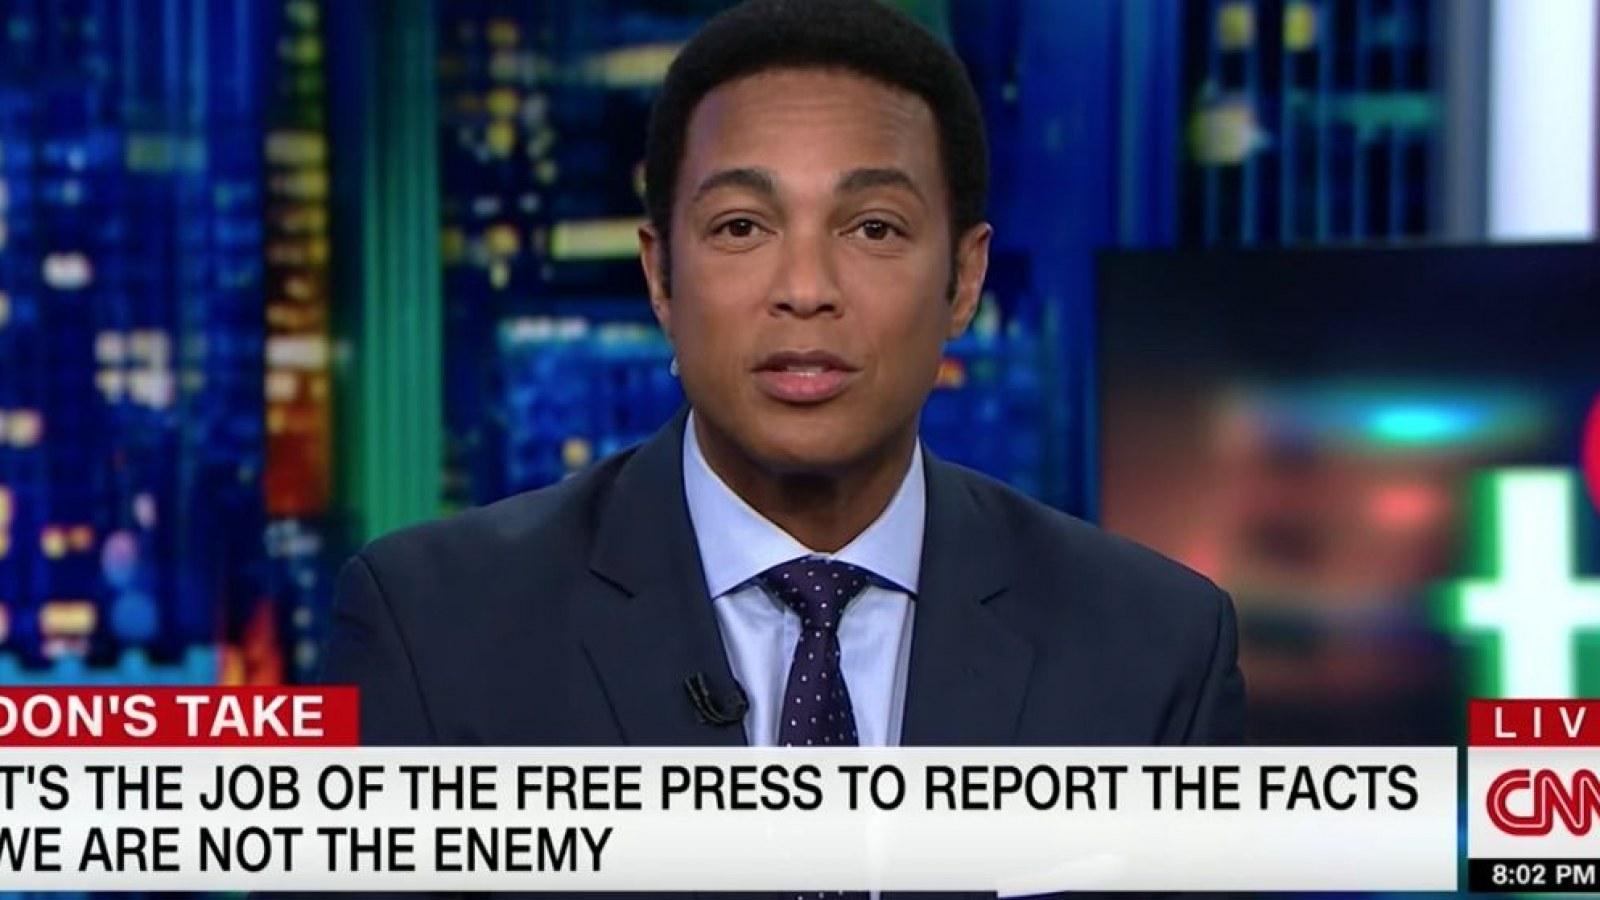 Watch Don Lemon Slams Trump After Cnn